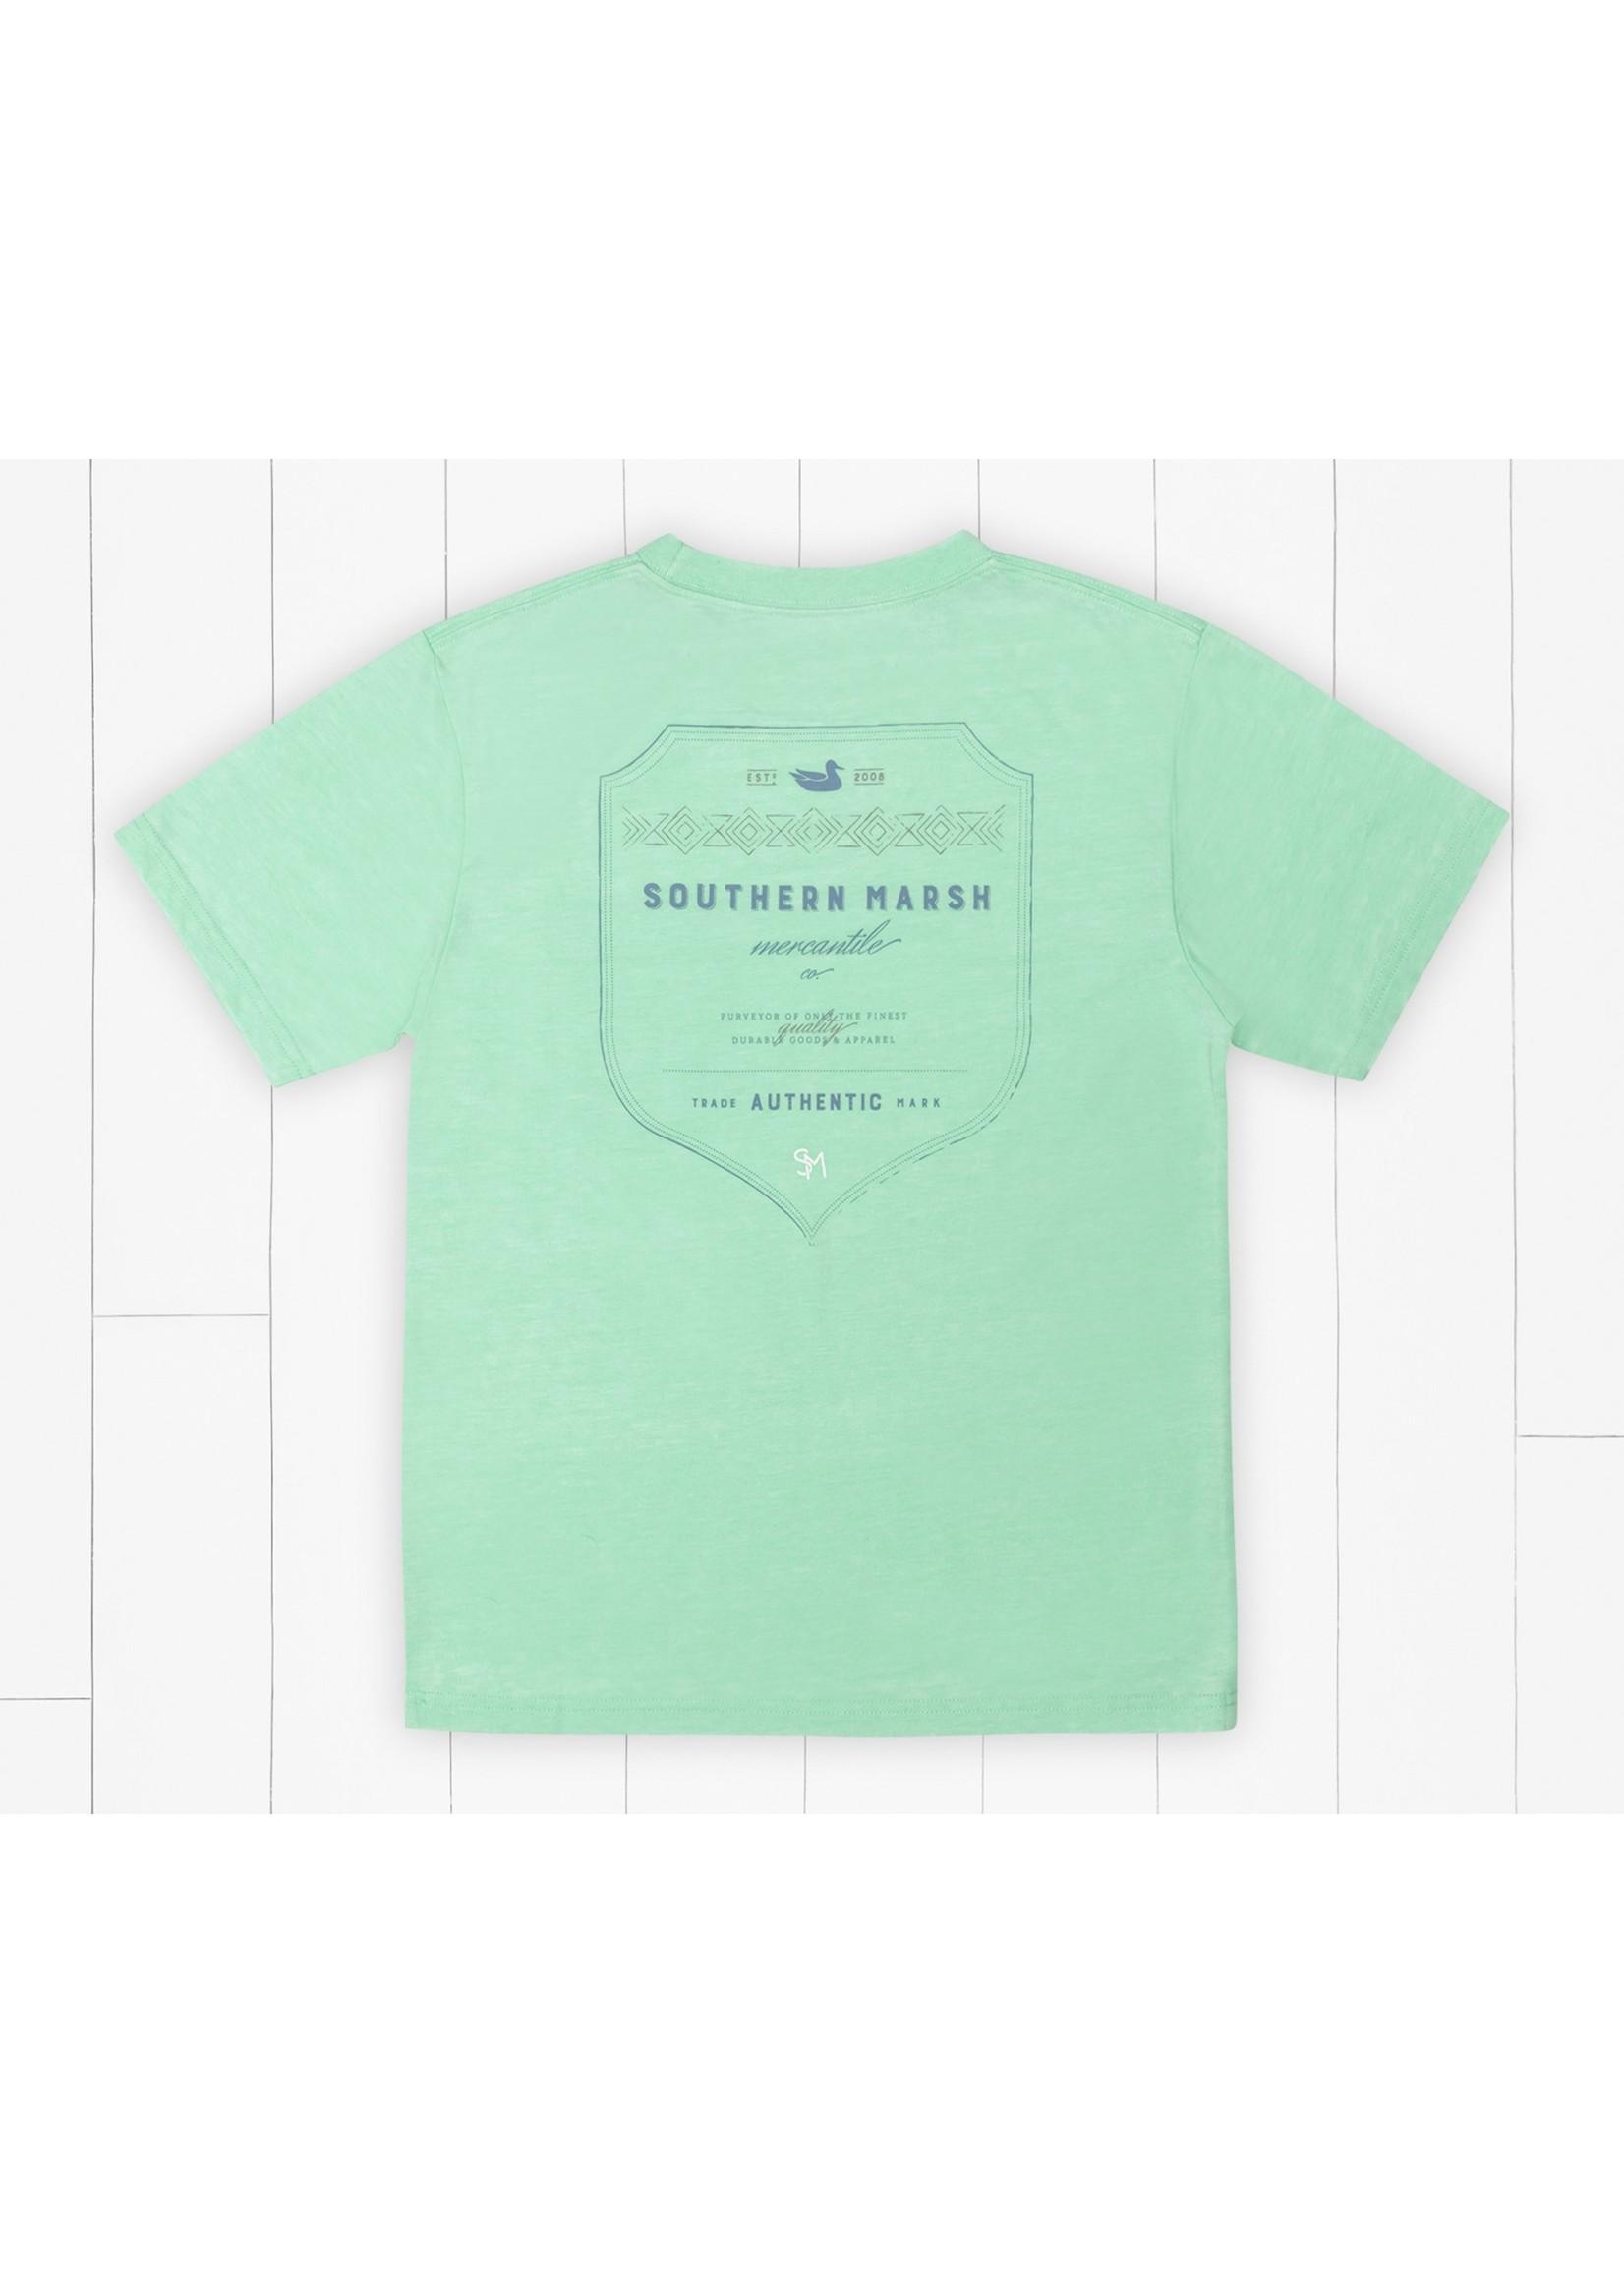 Southern Marsh Youth SEAWASH™ Tee - Mercantile Co.